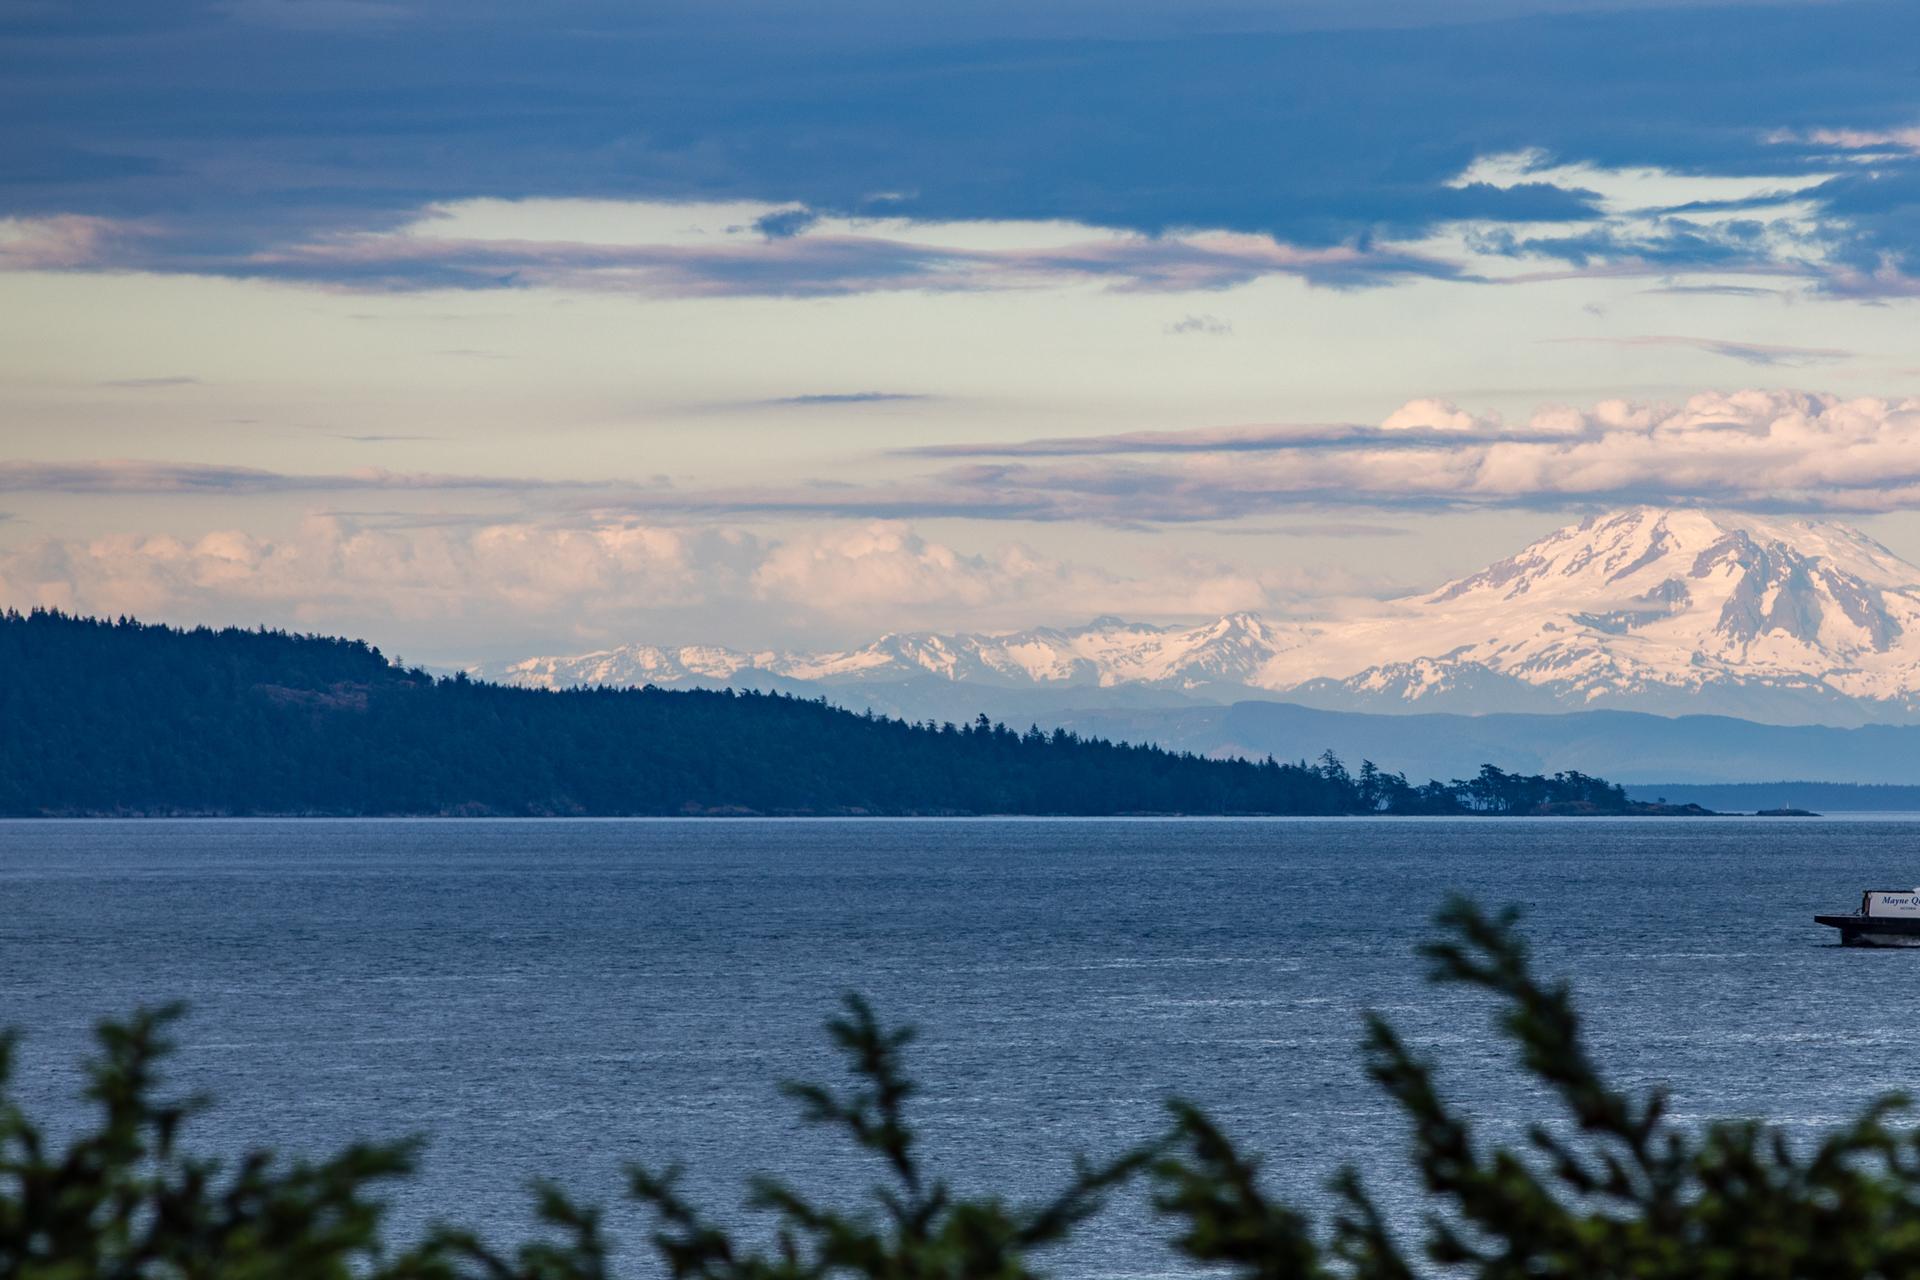 Mount Baker on the Horizon at 1850 Lands End Road, Lands End, North Saanich